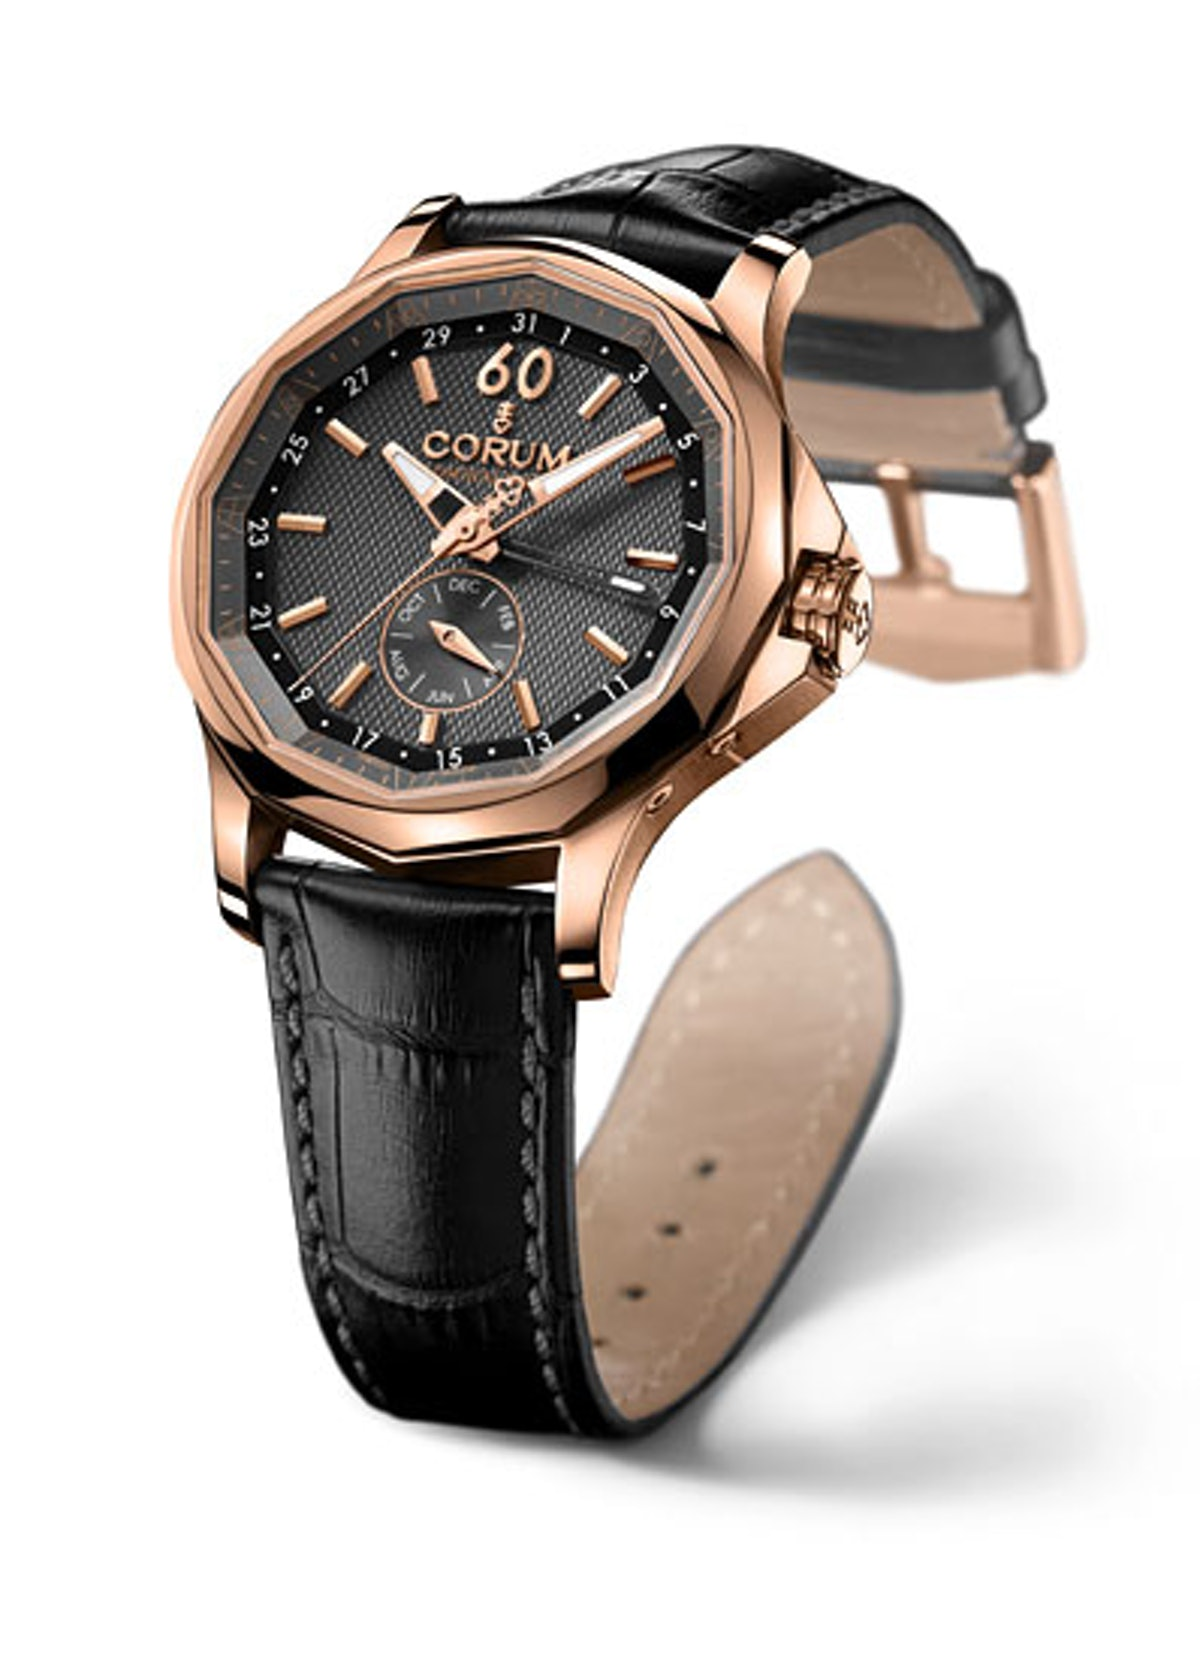 acss-basel-watches-roundup-10-v.jpg